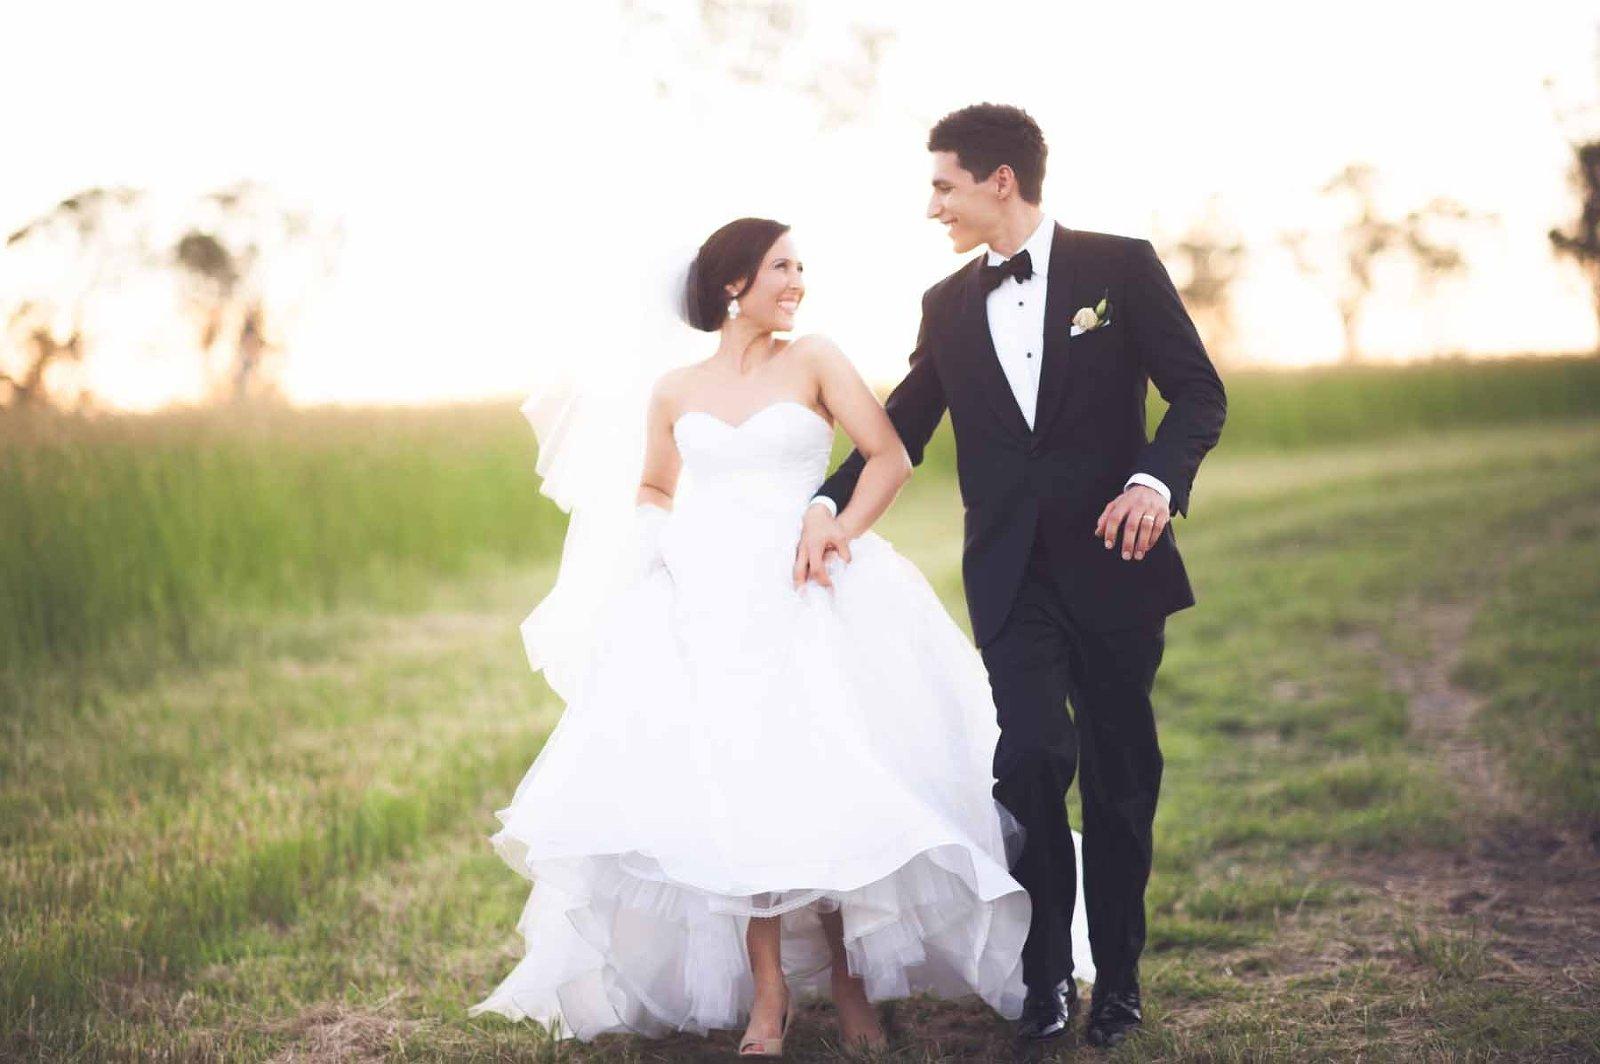 Brisbane wedding reception venue Sirromet winery - fields